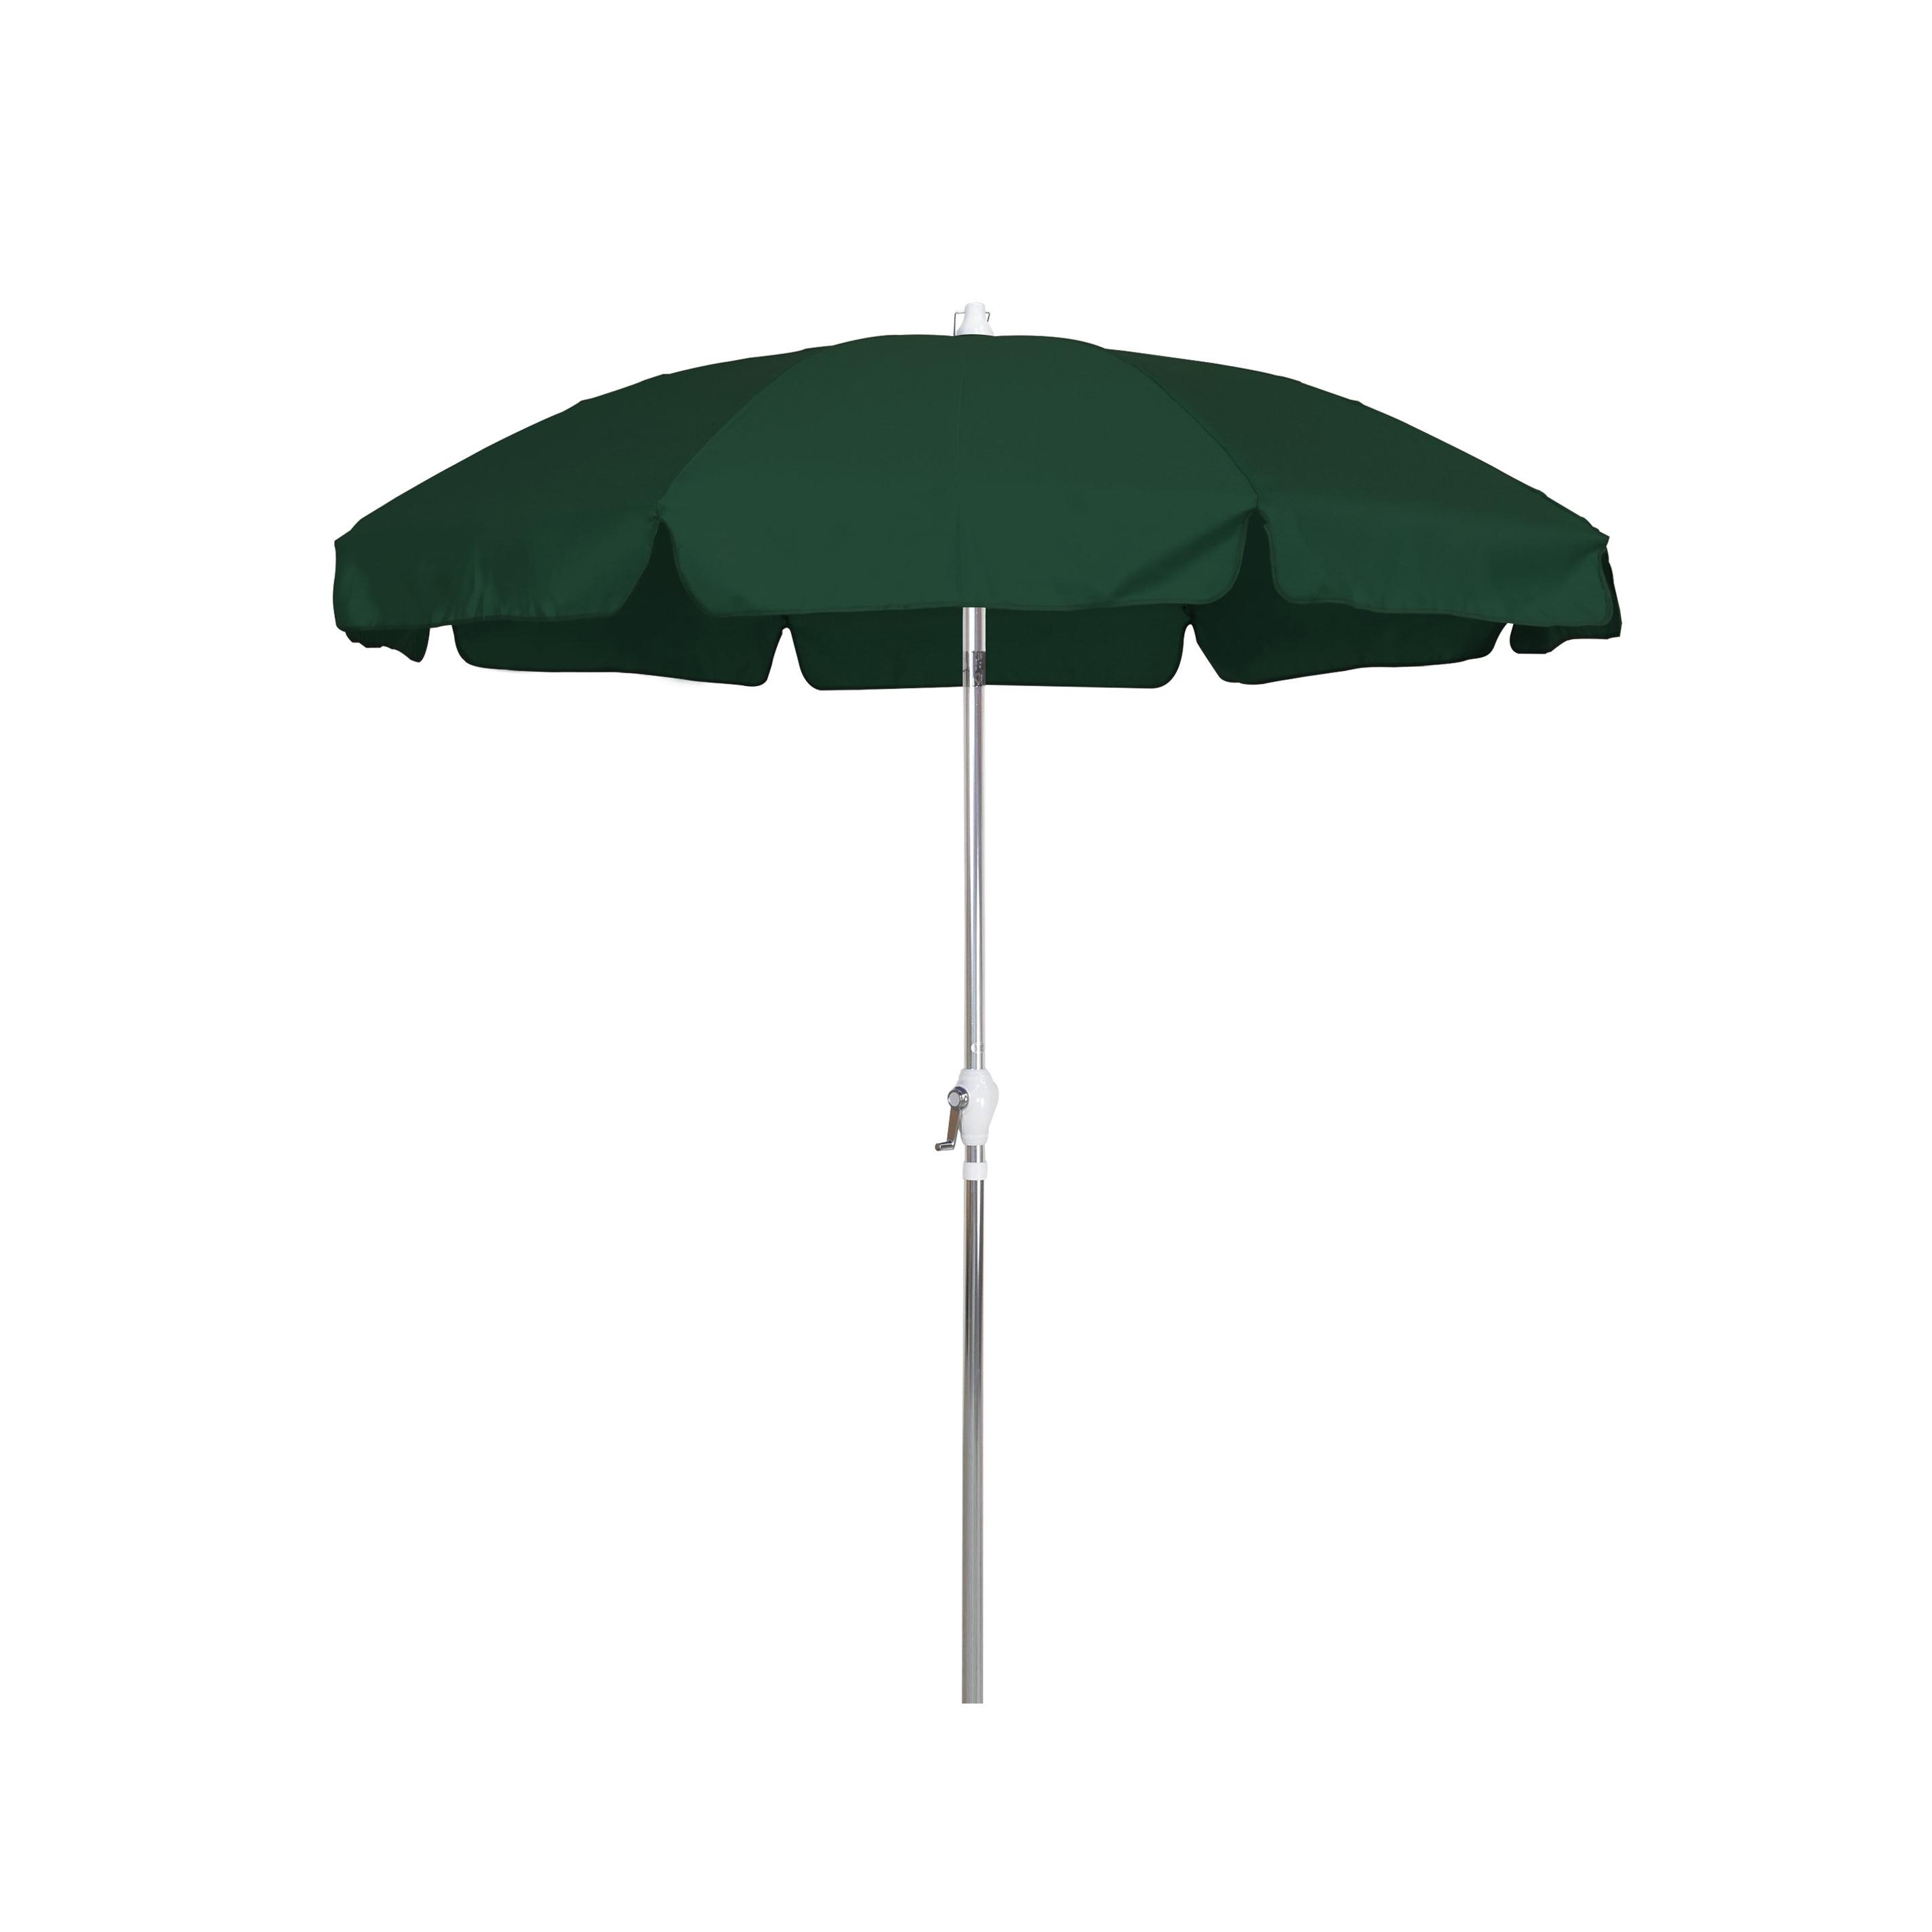 Best And Newest Pedrick Drape Market Umbrellas With 7.5' Market Umbrella (Gallery 9 of 20)